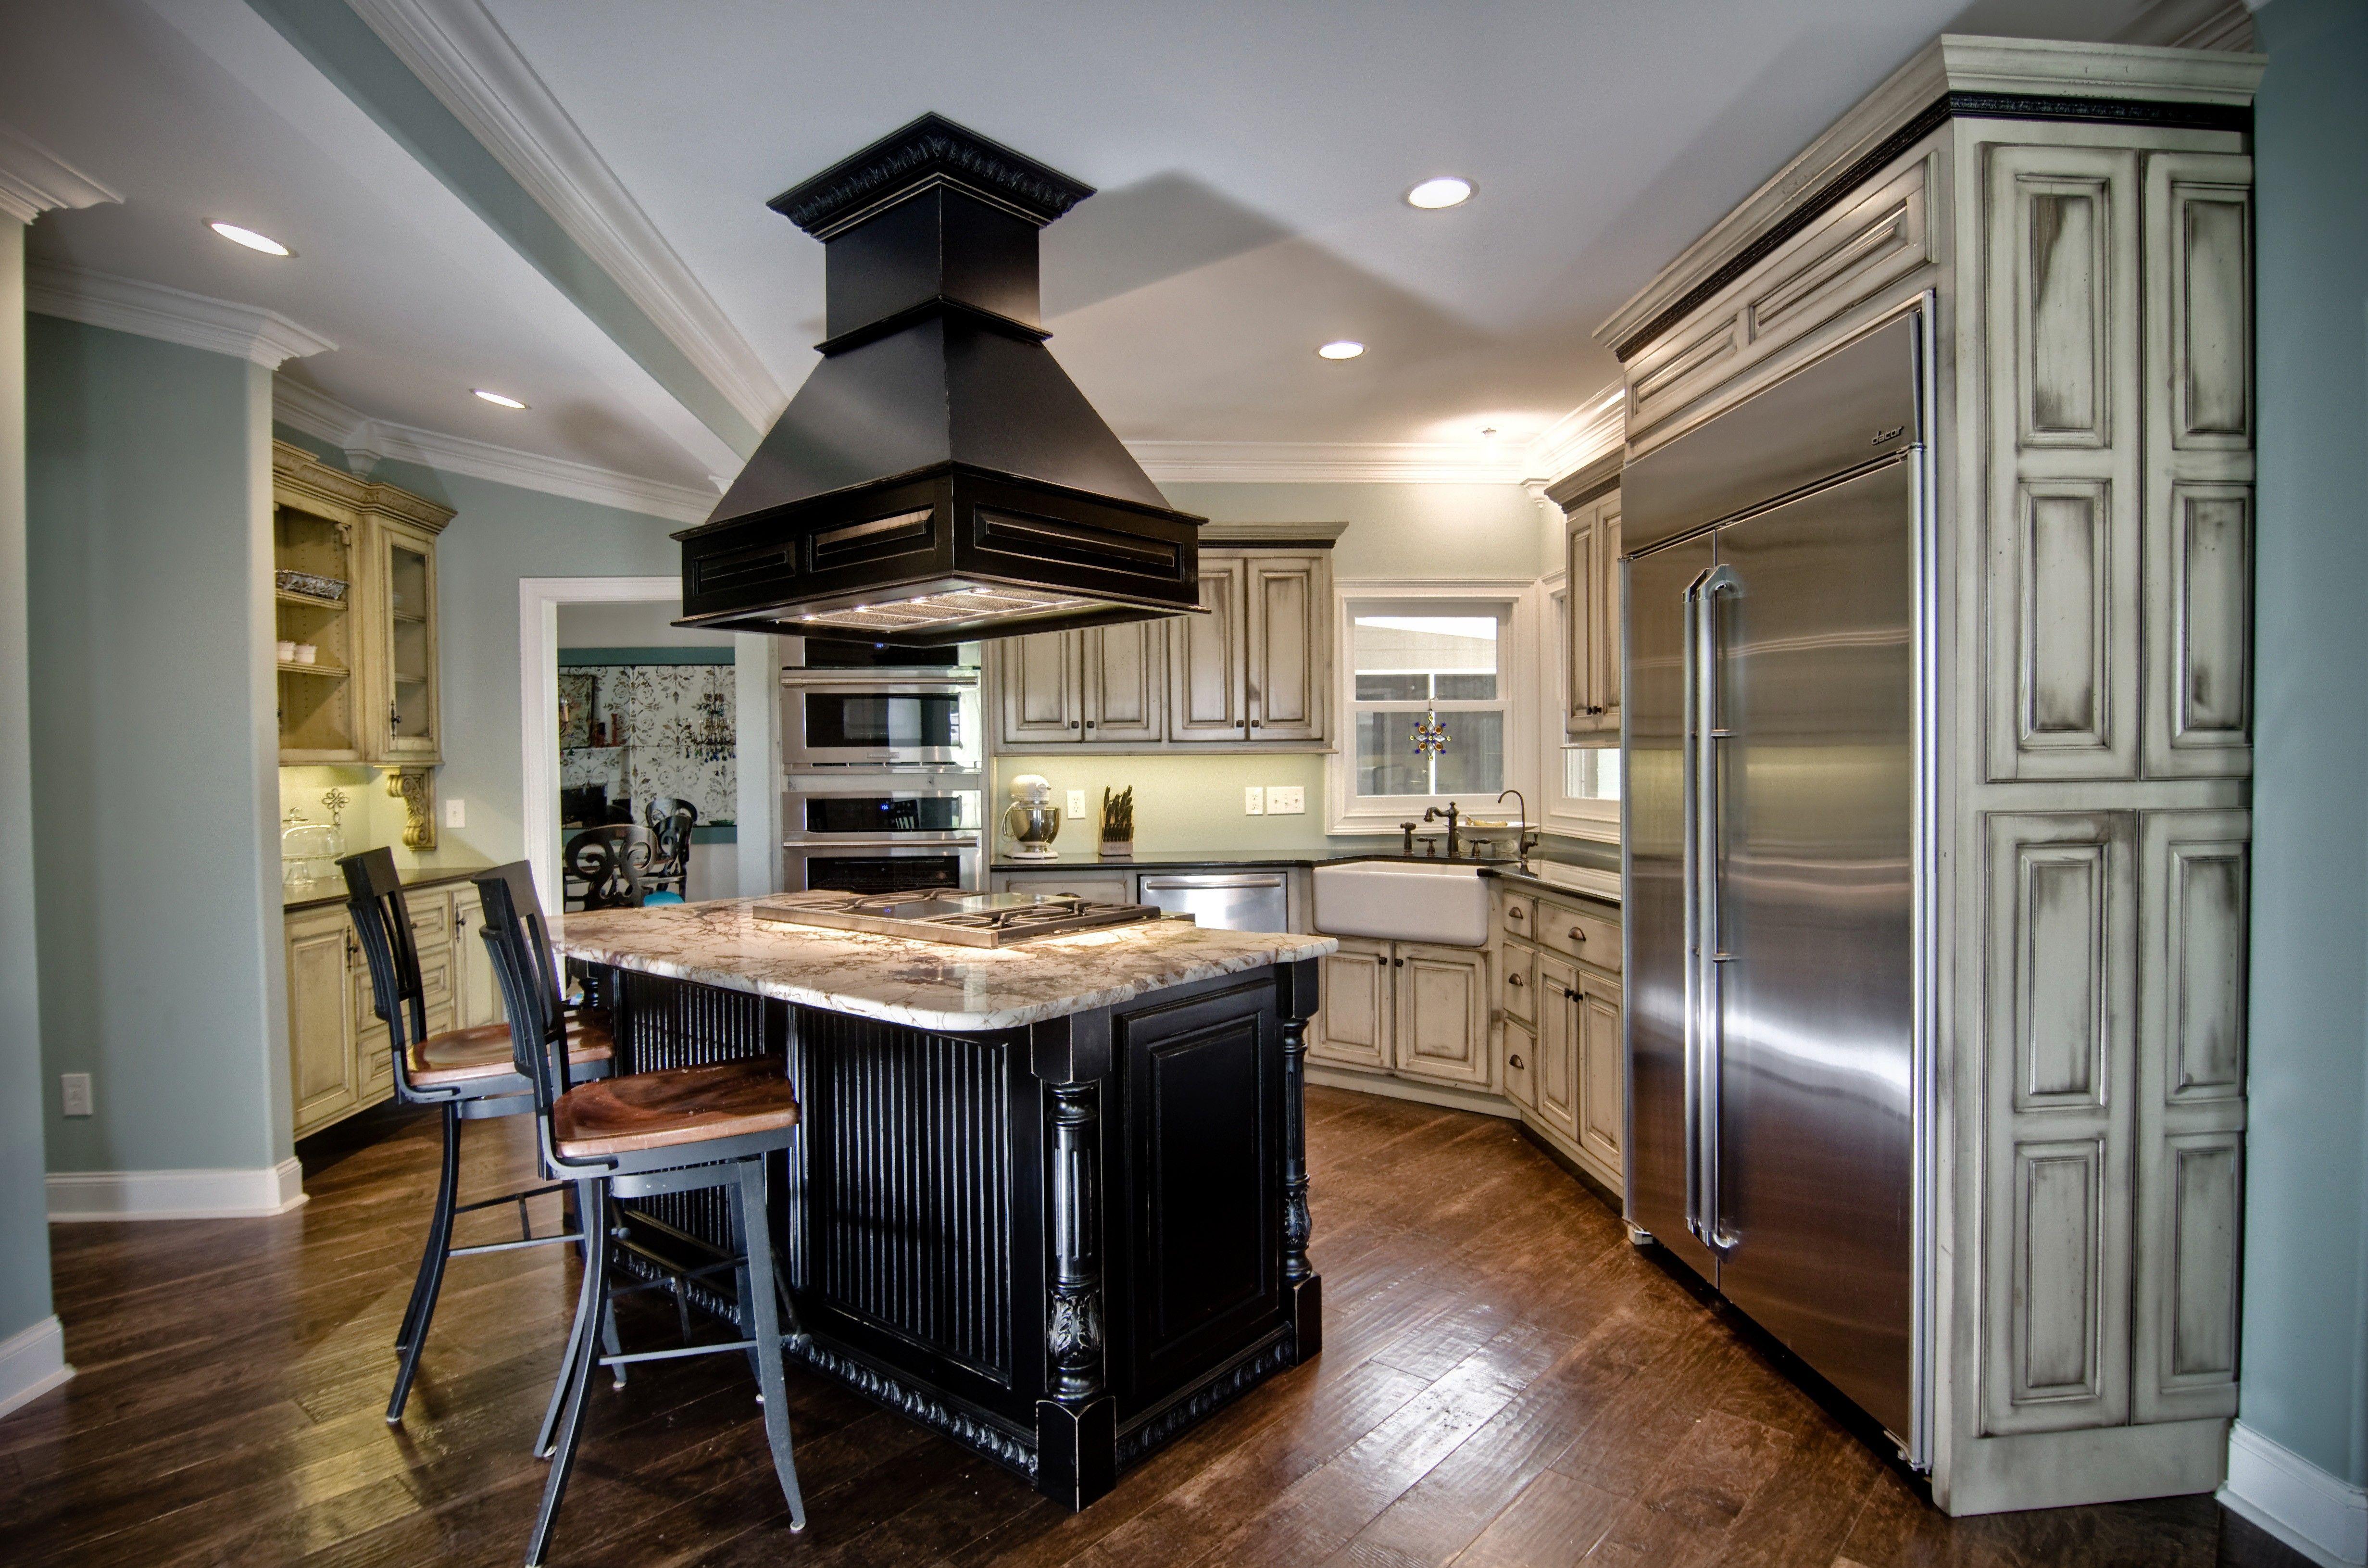 Grey Stainless Steel Kitchen Island Vent Hood Combined Shaped Window Islands Keuken Inspiratie Keuken